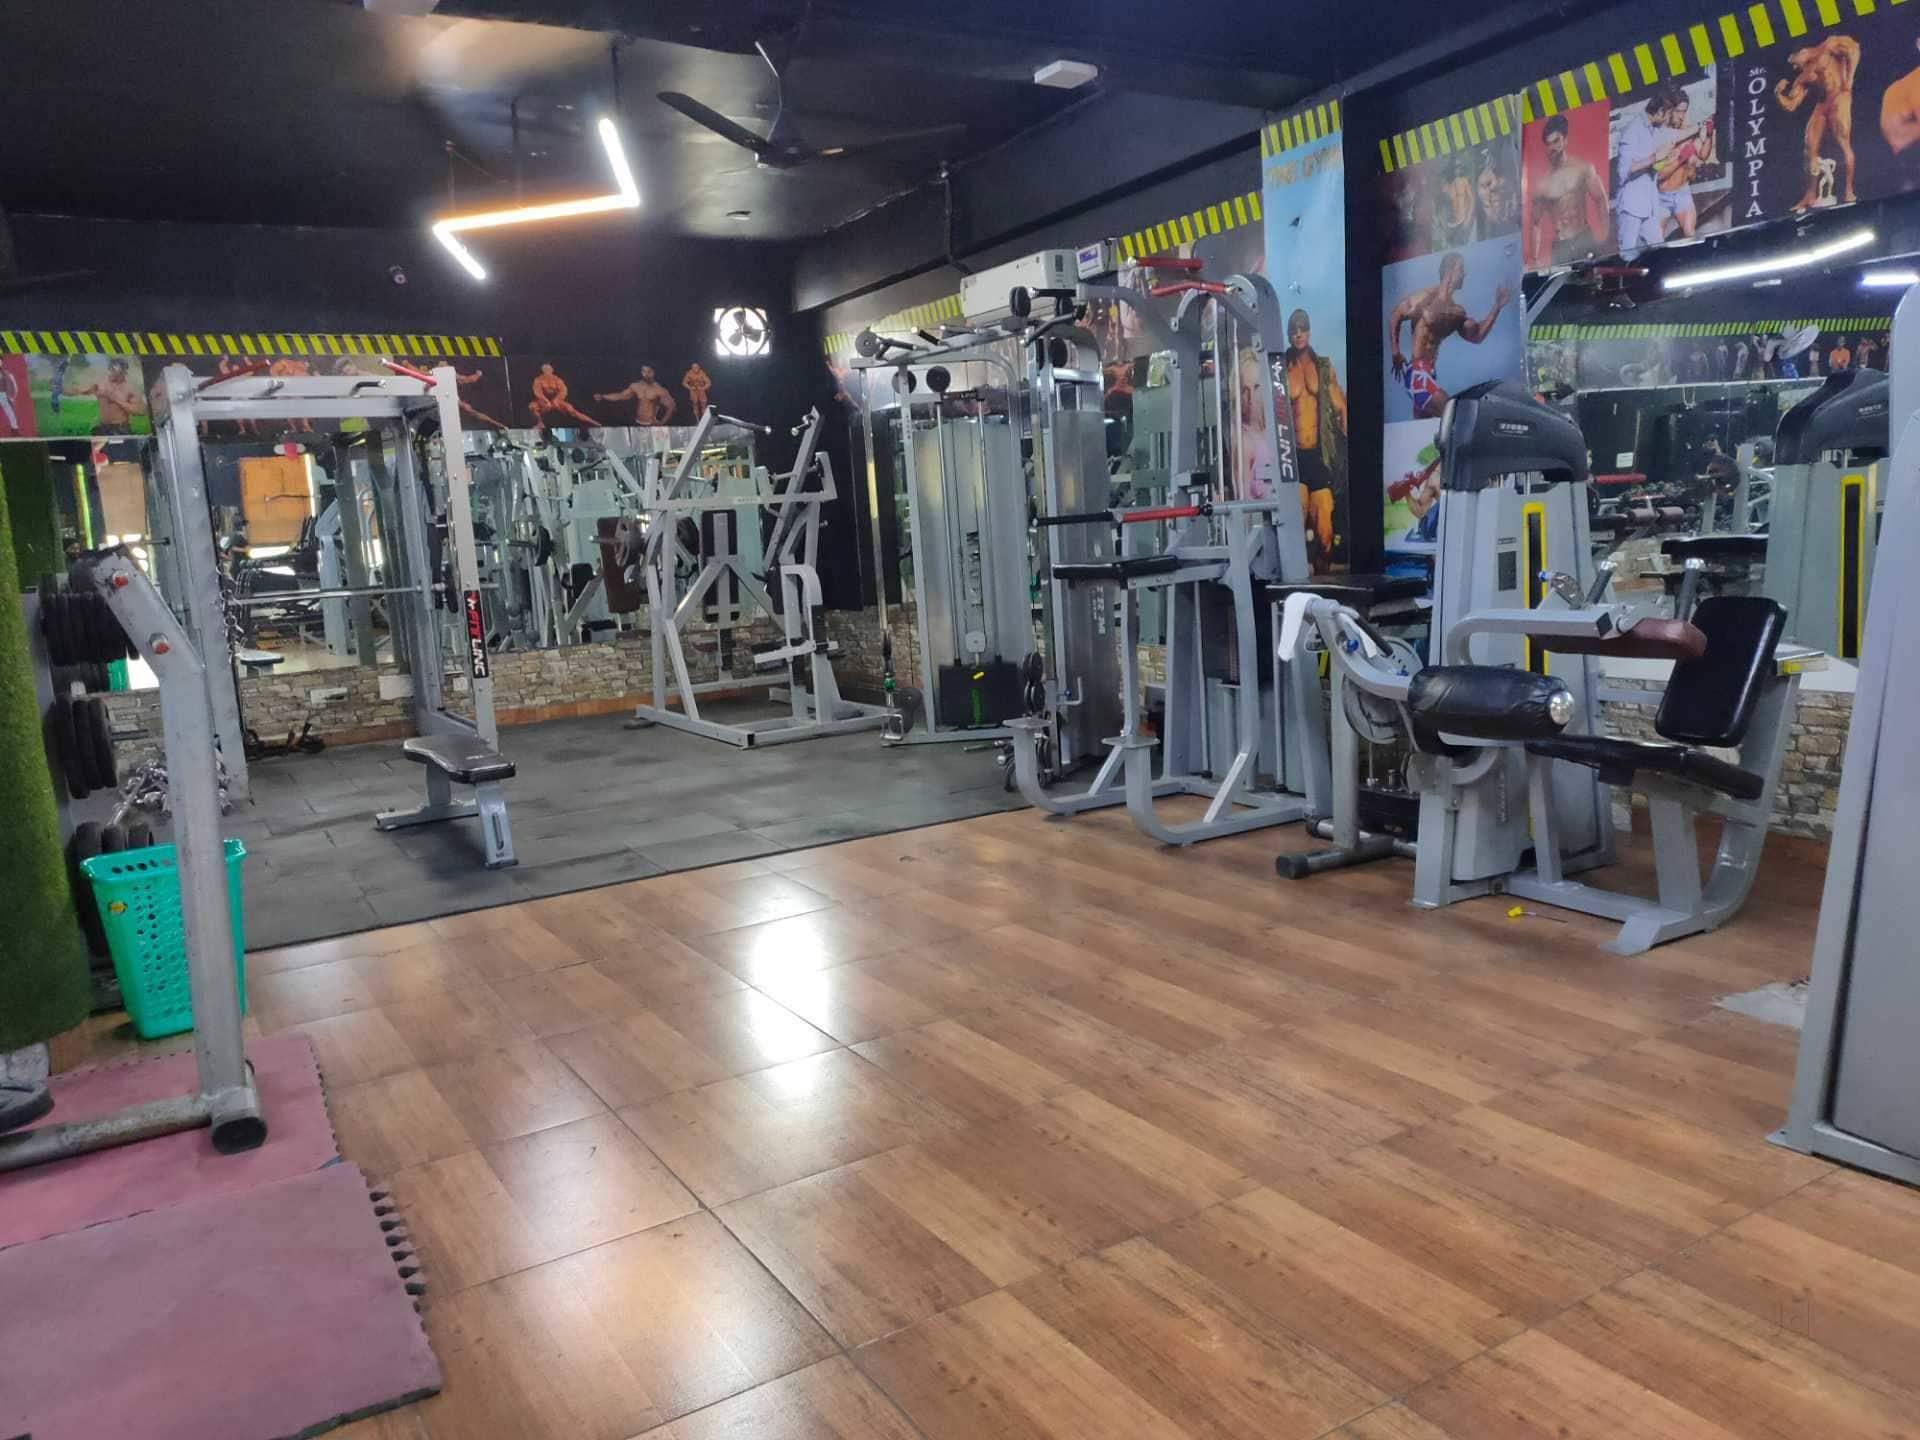 X Factor Gym in Noida